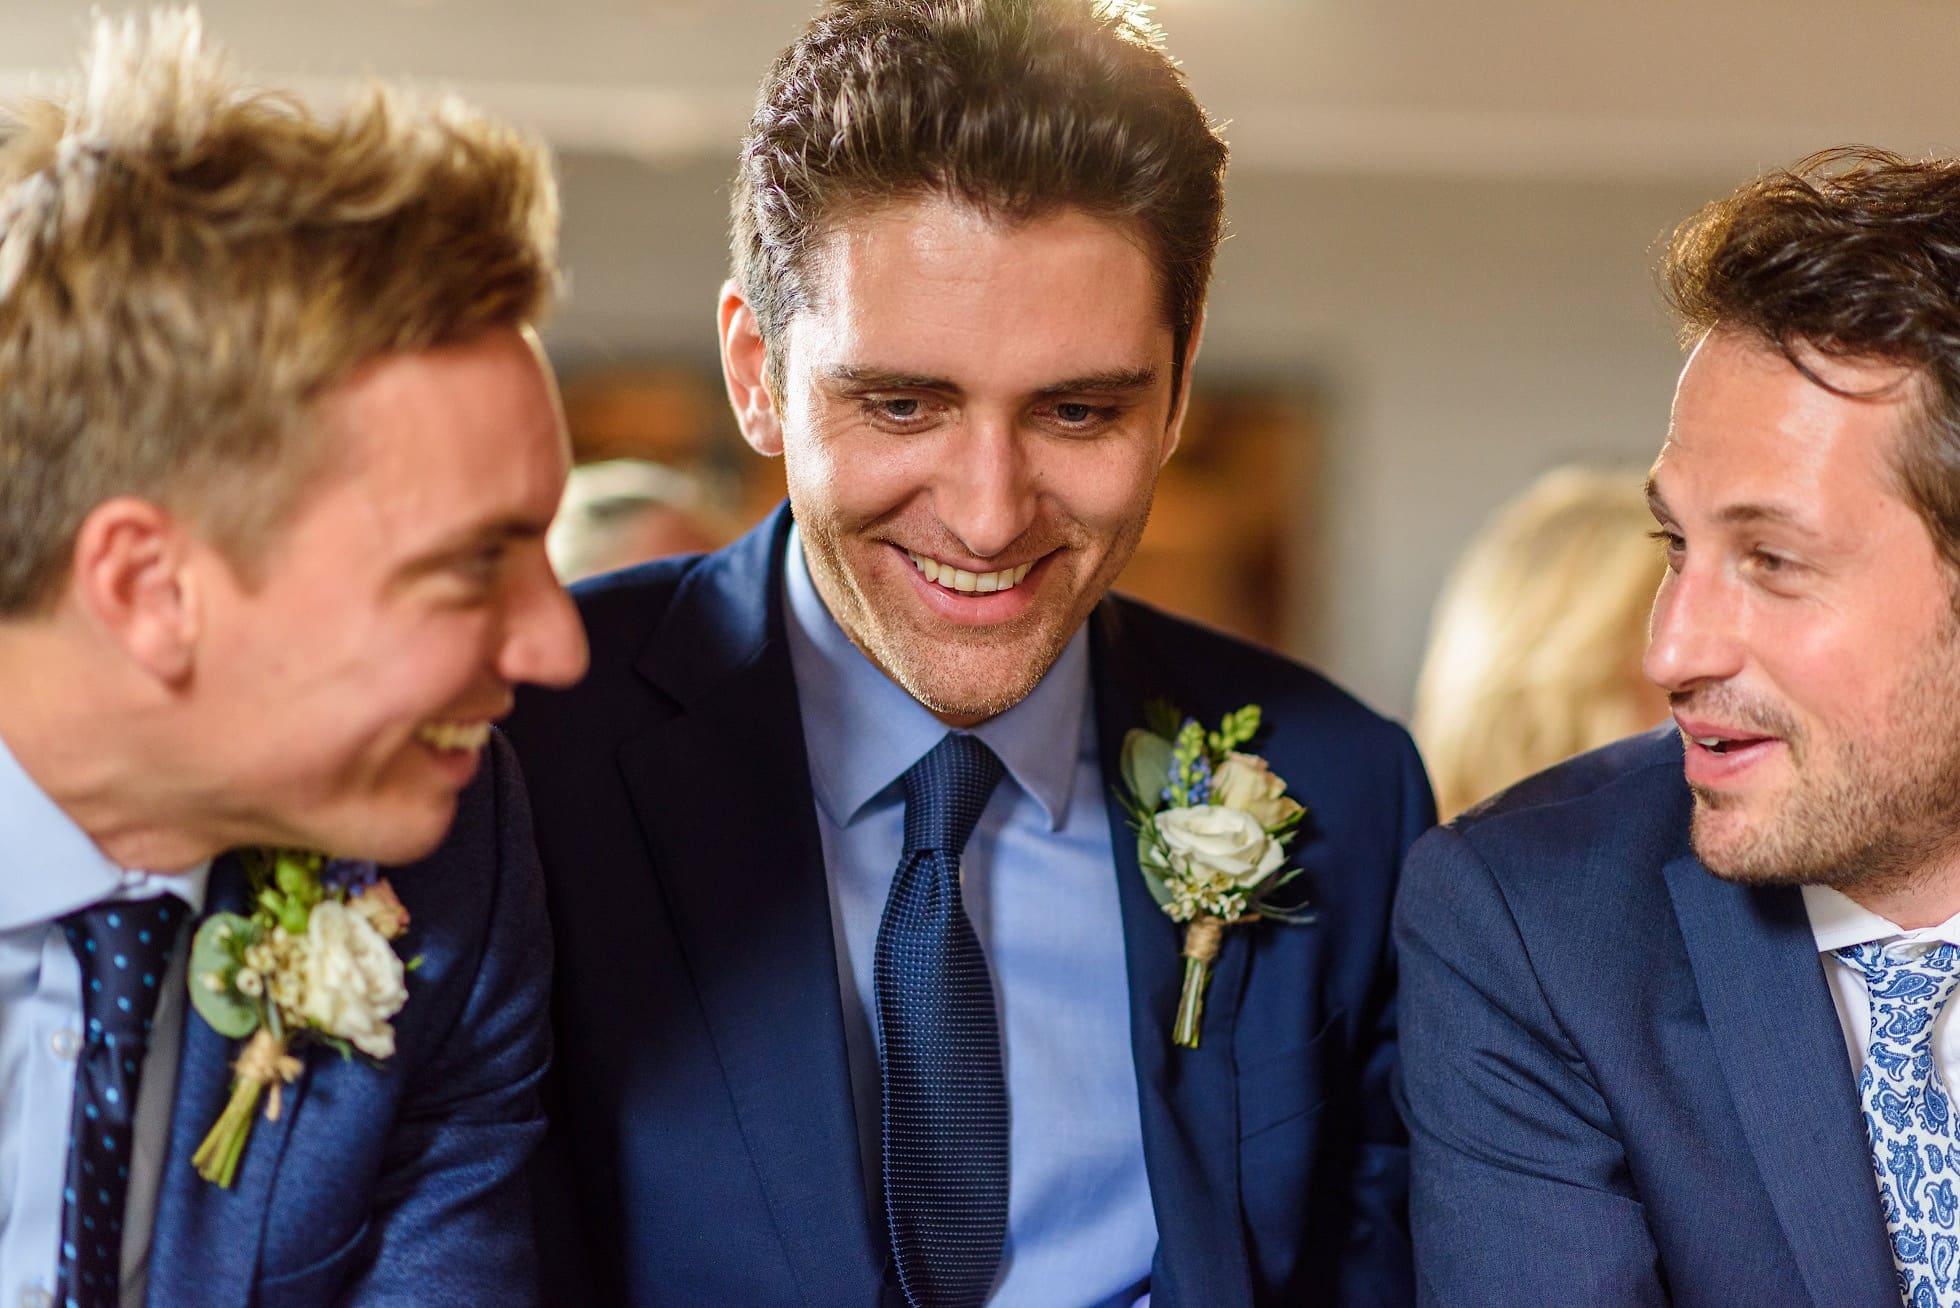 Groomsmen during the ceremony